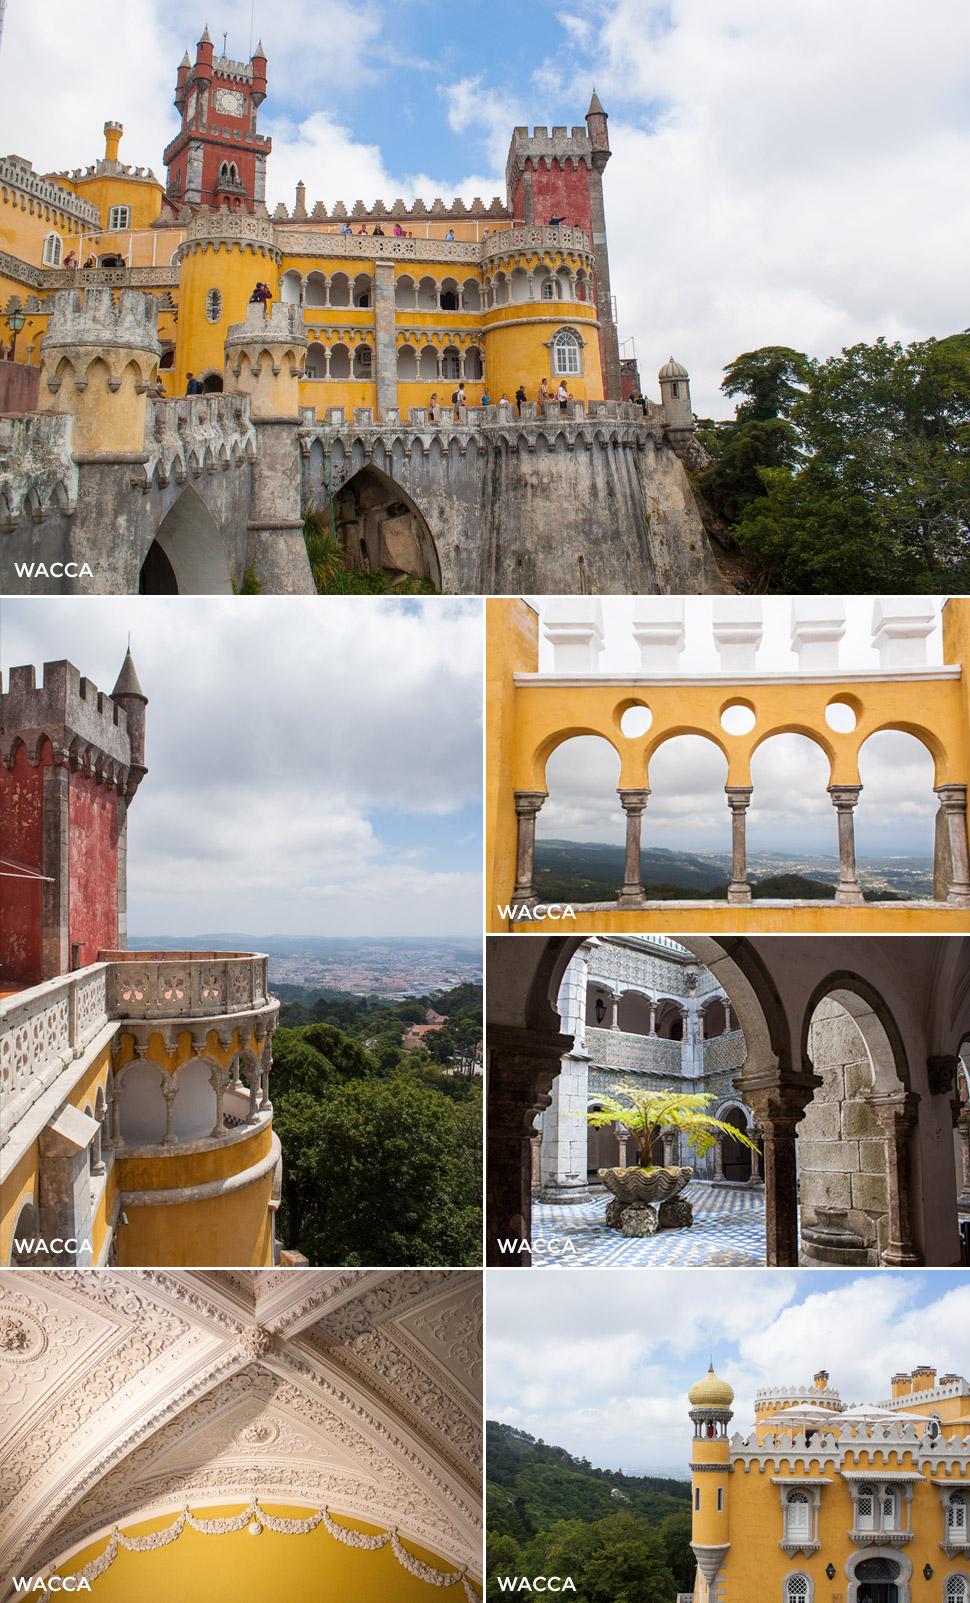 wacca-reisblog-palaciodapena-collage